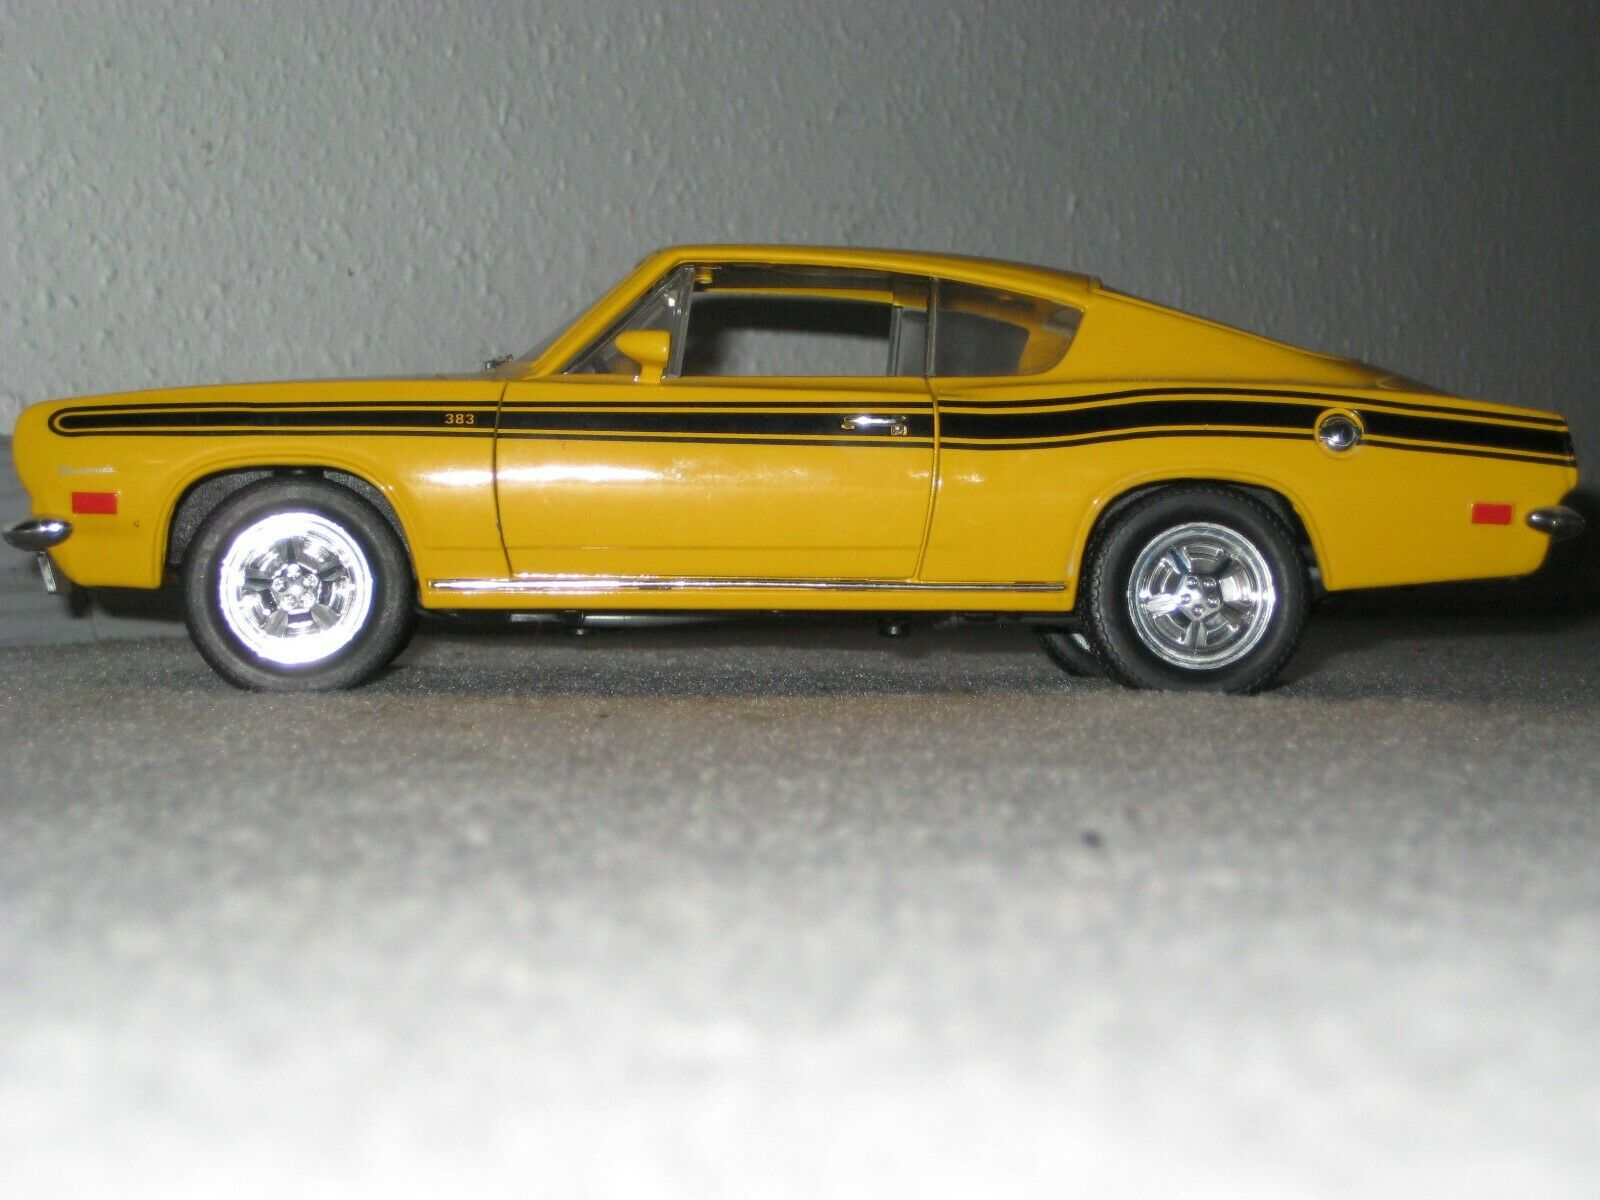 1 18 Modell,1969 Plymouth Barracuda,Oldtimer, Muscle Car,Rarität,Sammler,TOP